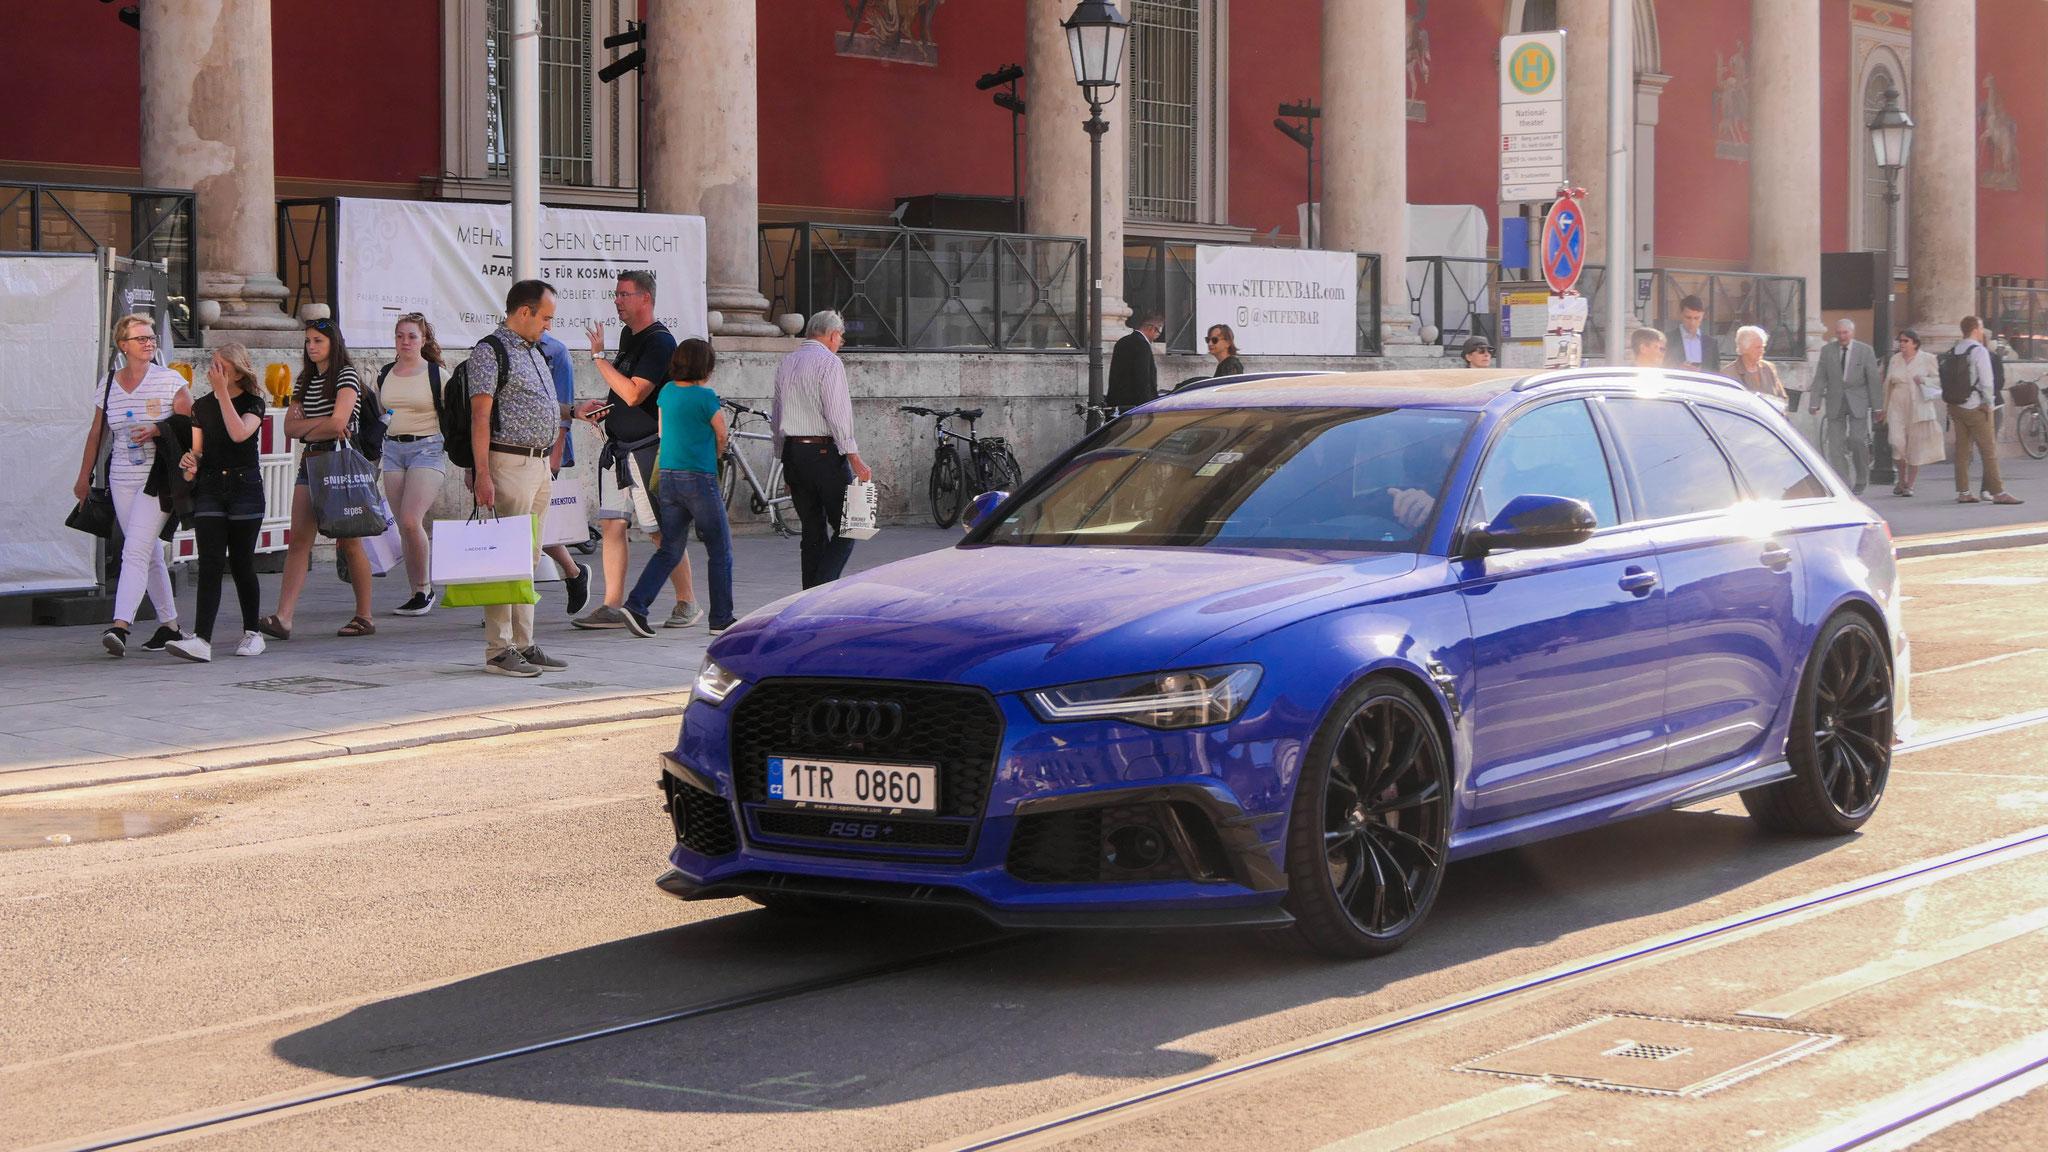 Audi RS6+ - 1TR-0860 (CZ)